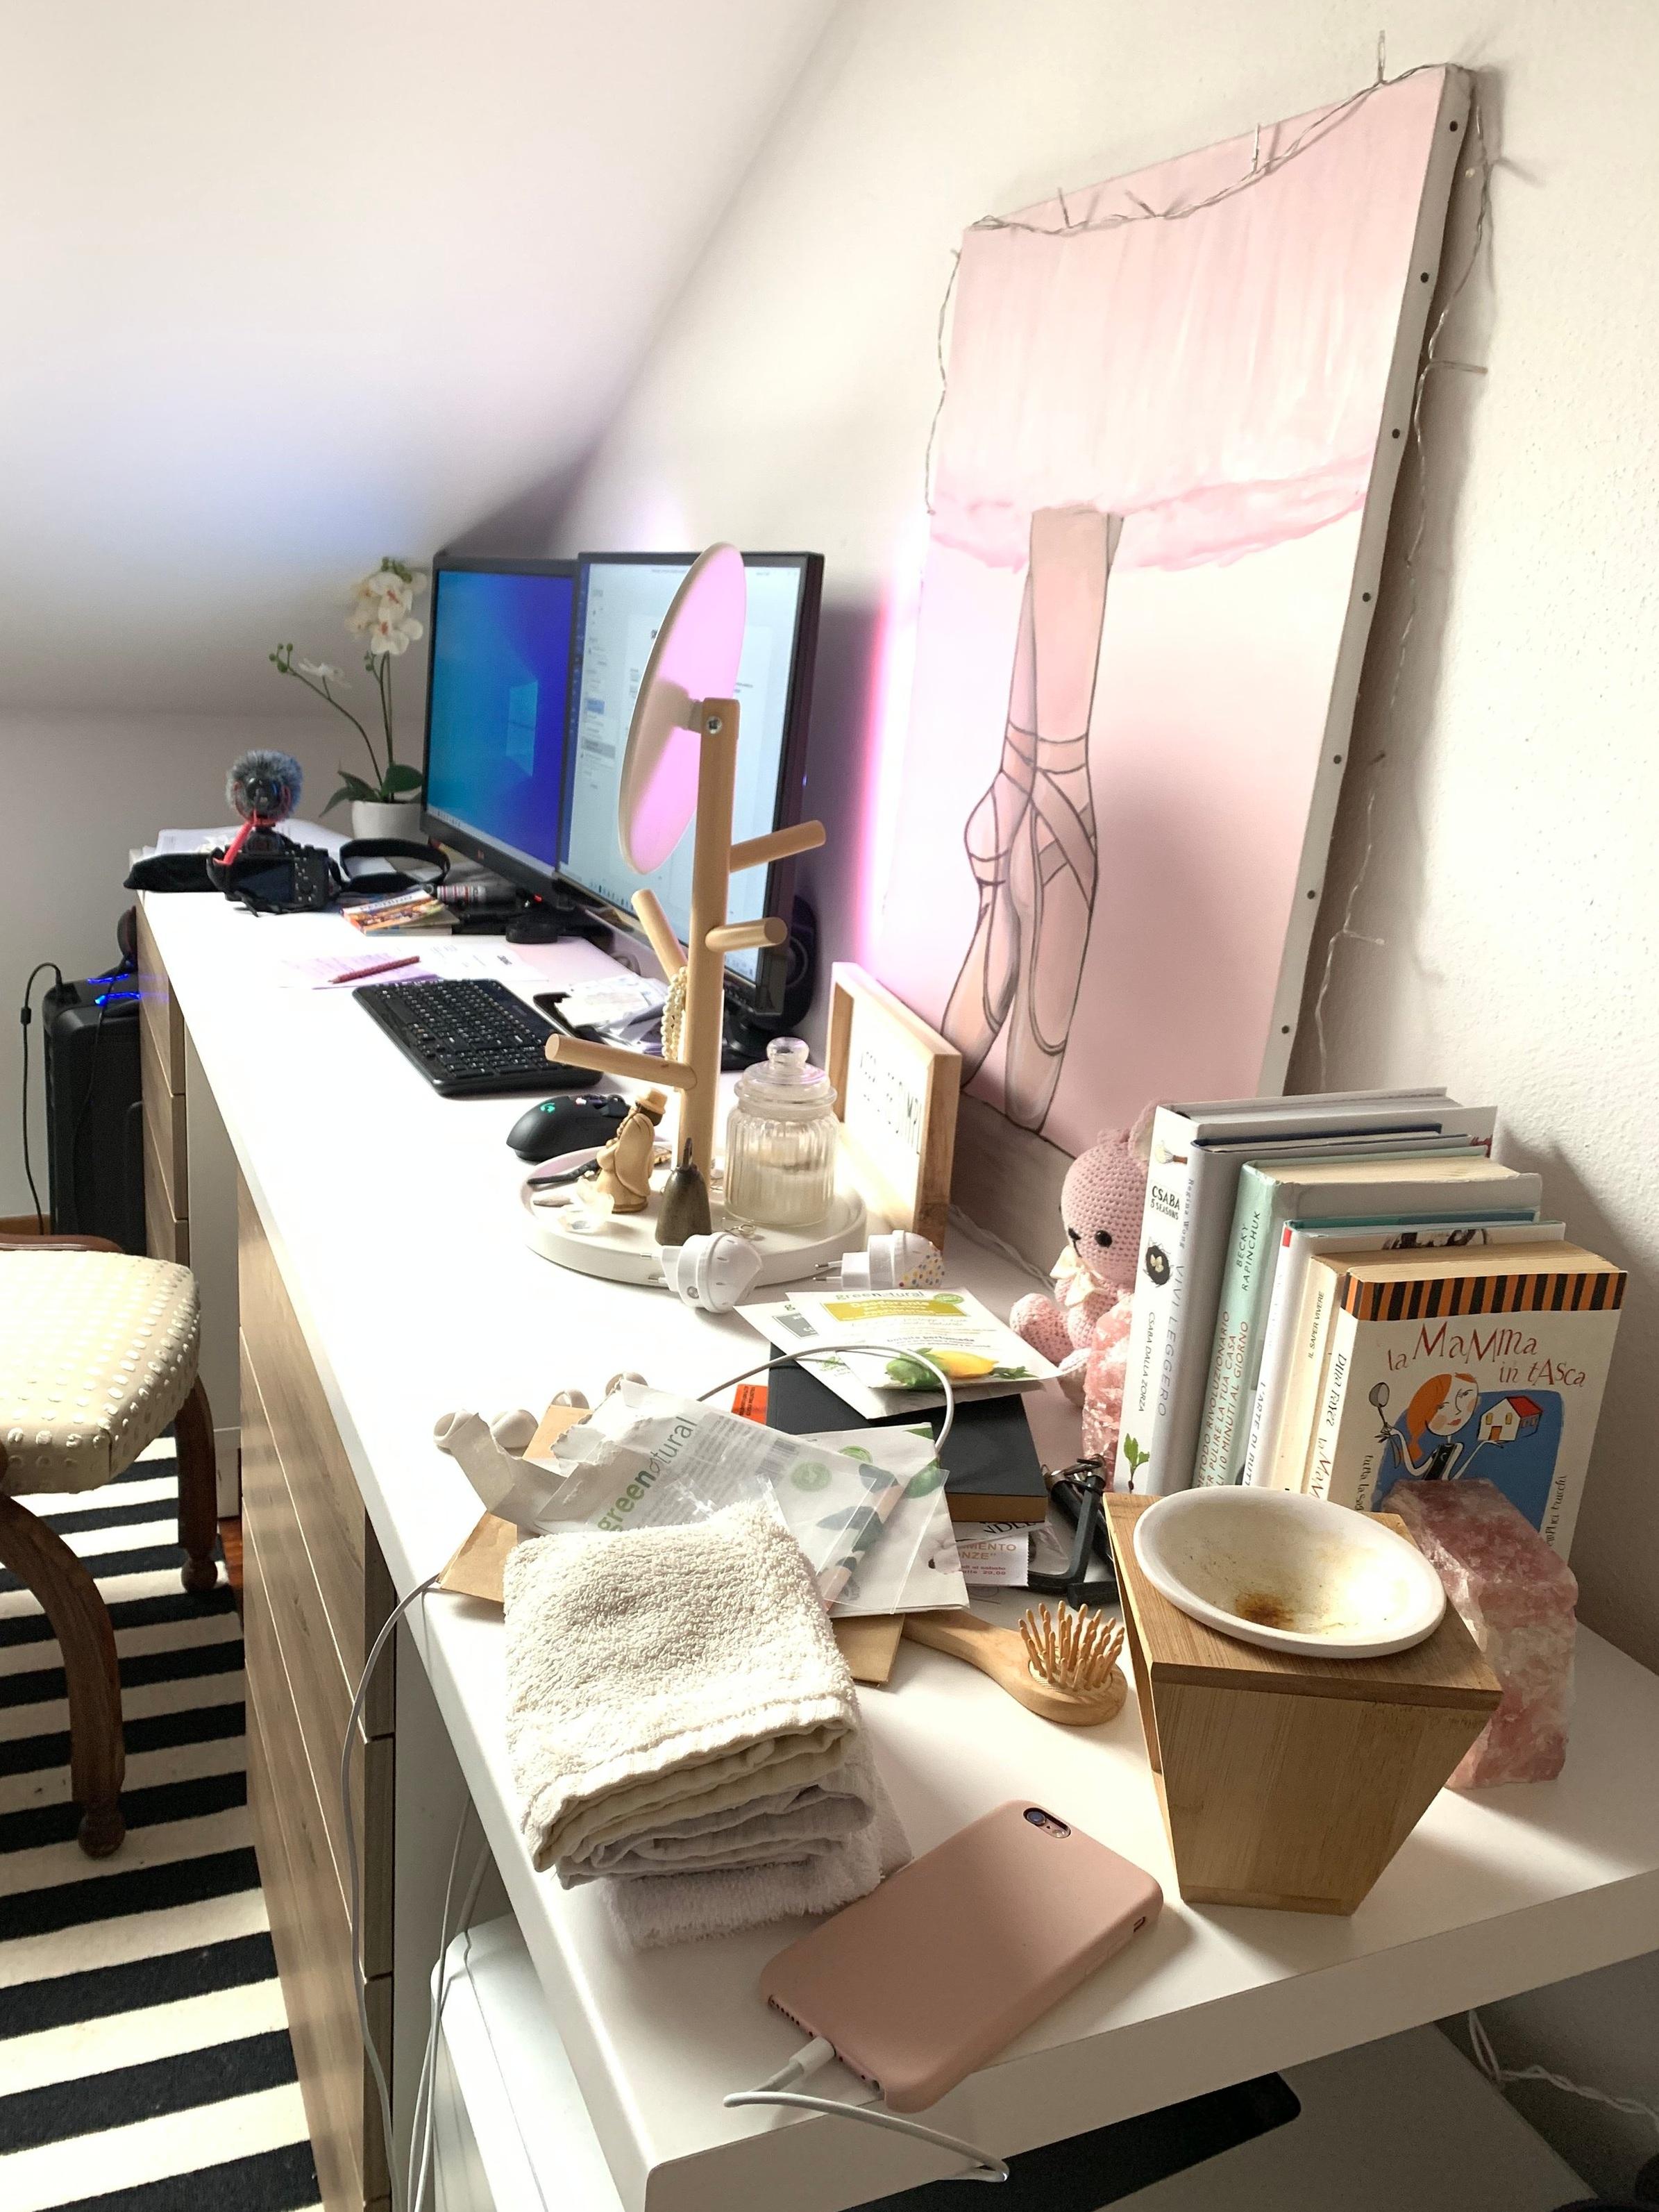 scrivania+disordine.jpg